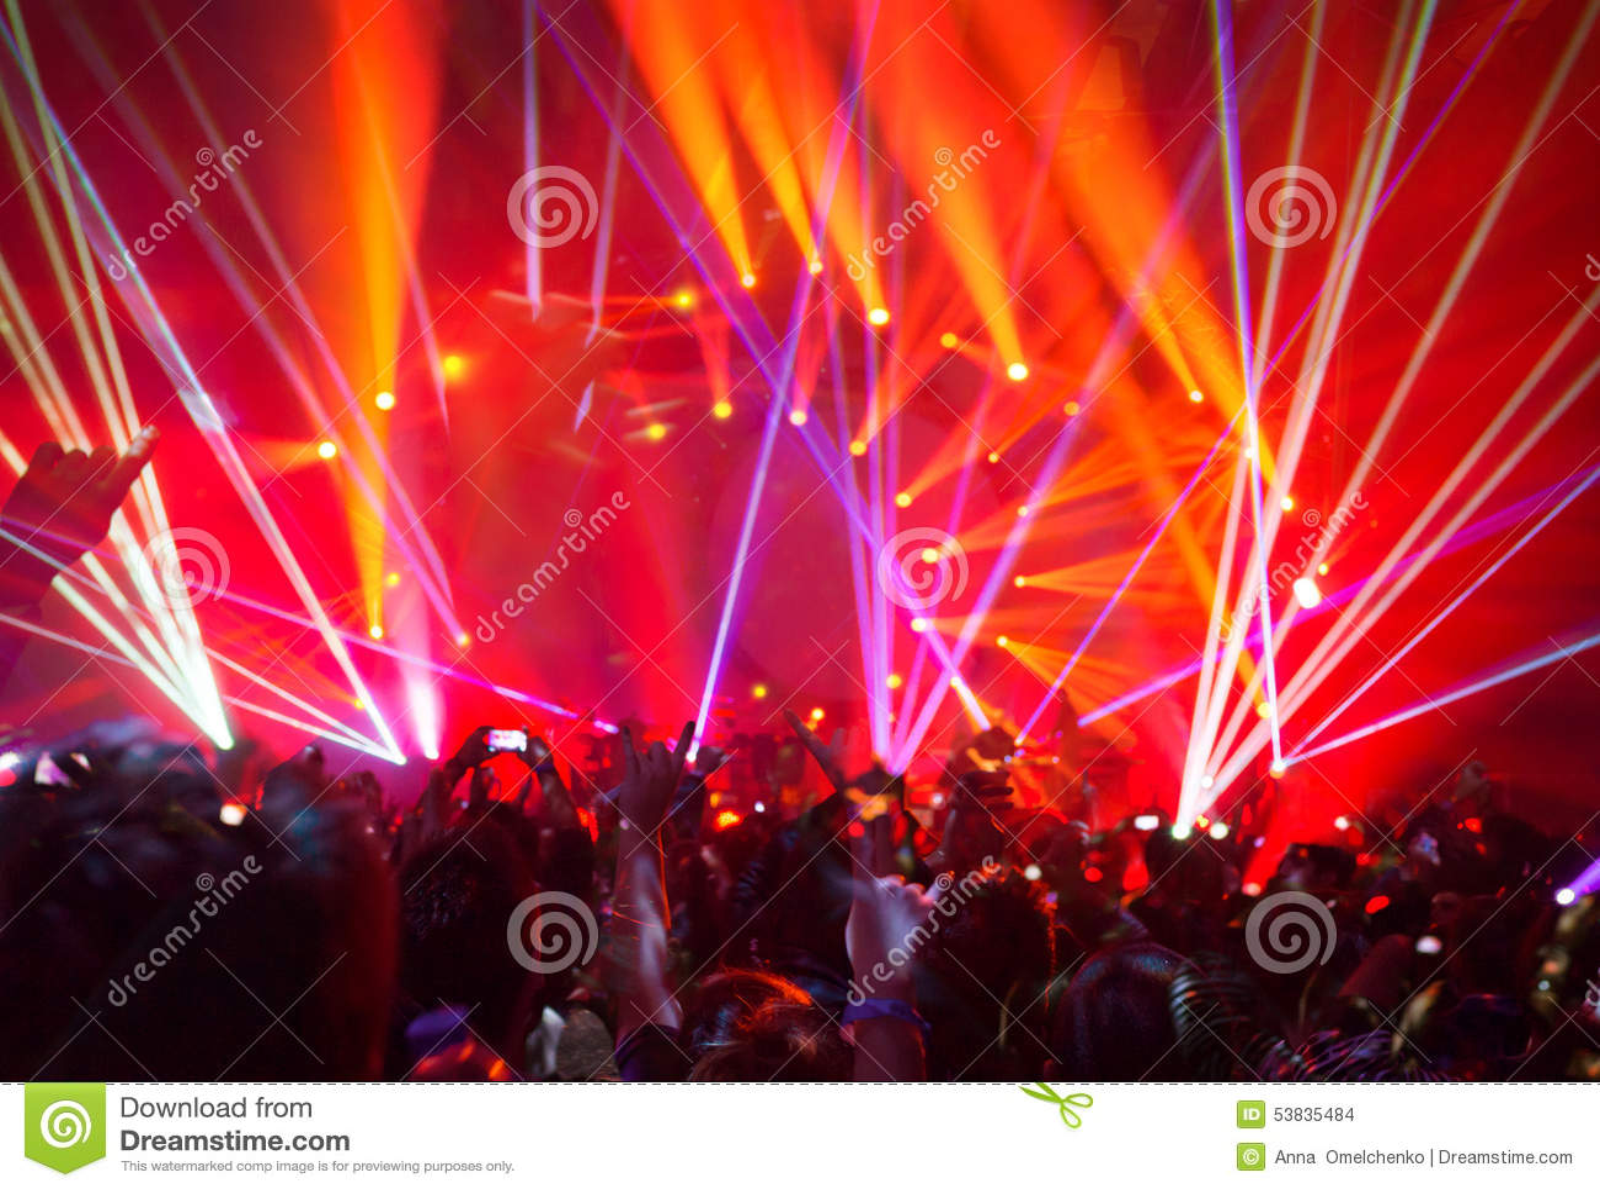 Pics photos rock concert background - Rock Concert Background